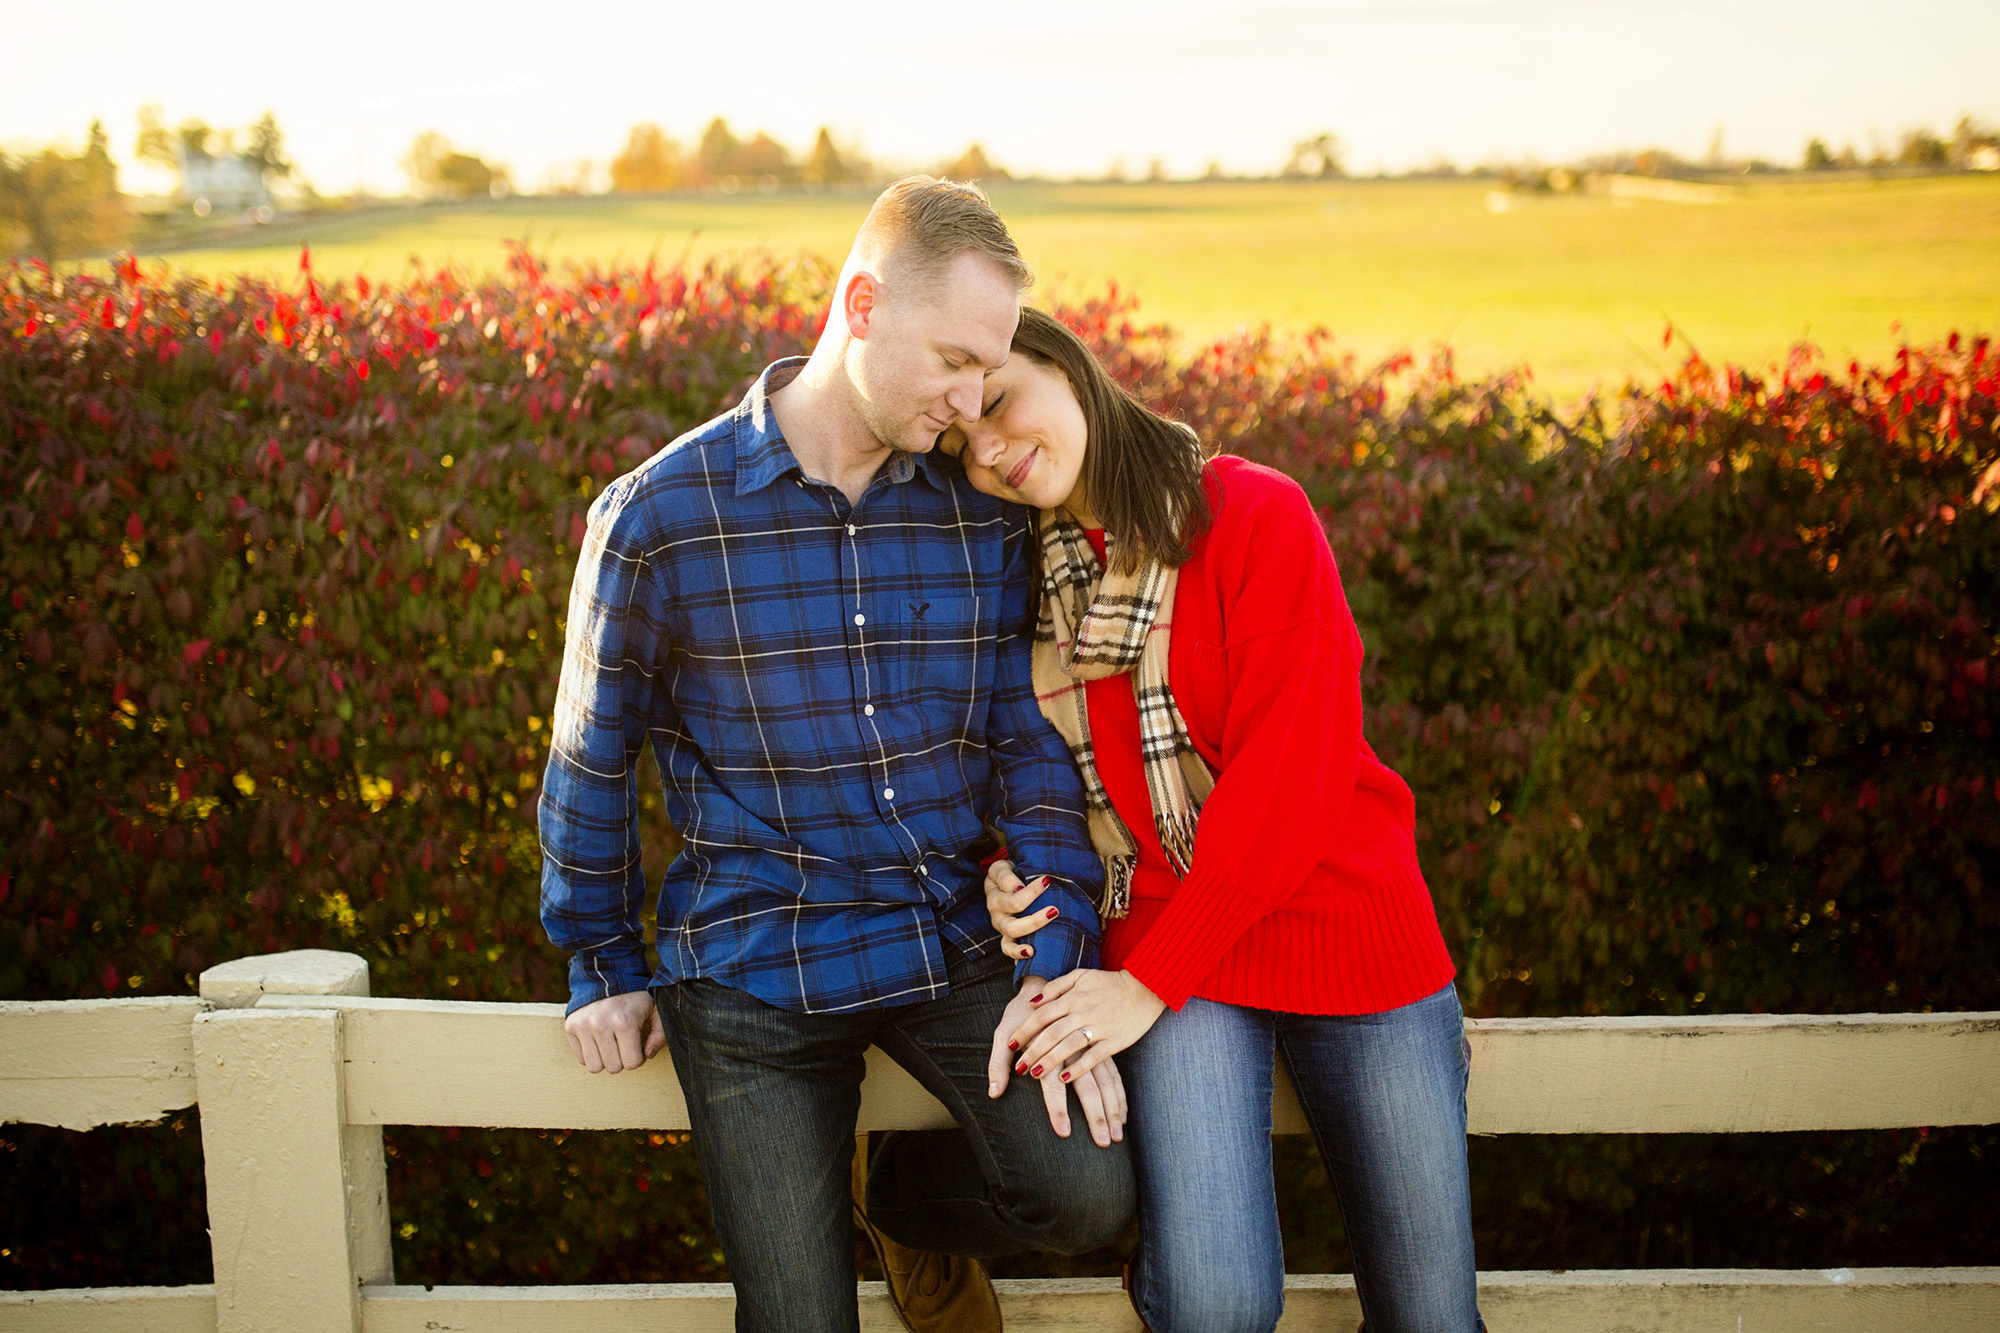 Seriously_Sabrina_Photography_Lexington_Kentucky_Backroads_Roadtrip_Engagement_RM070.jpg